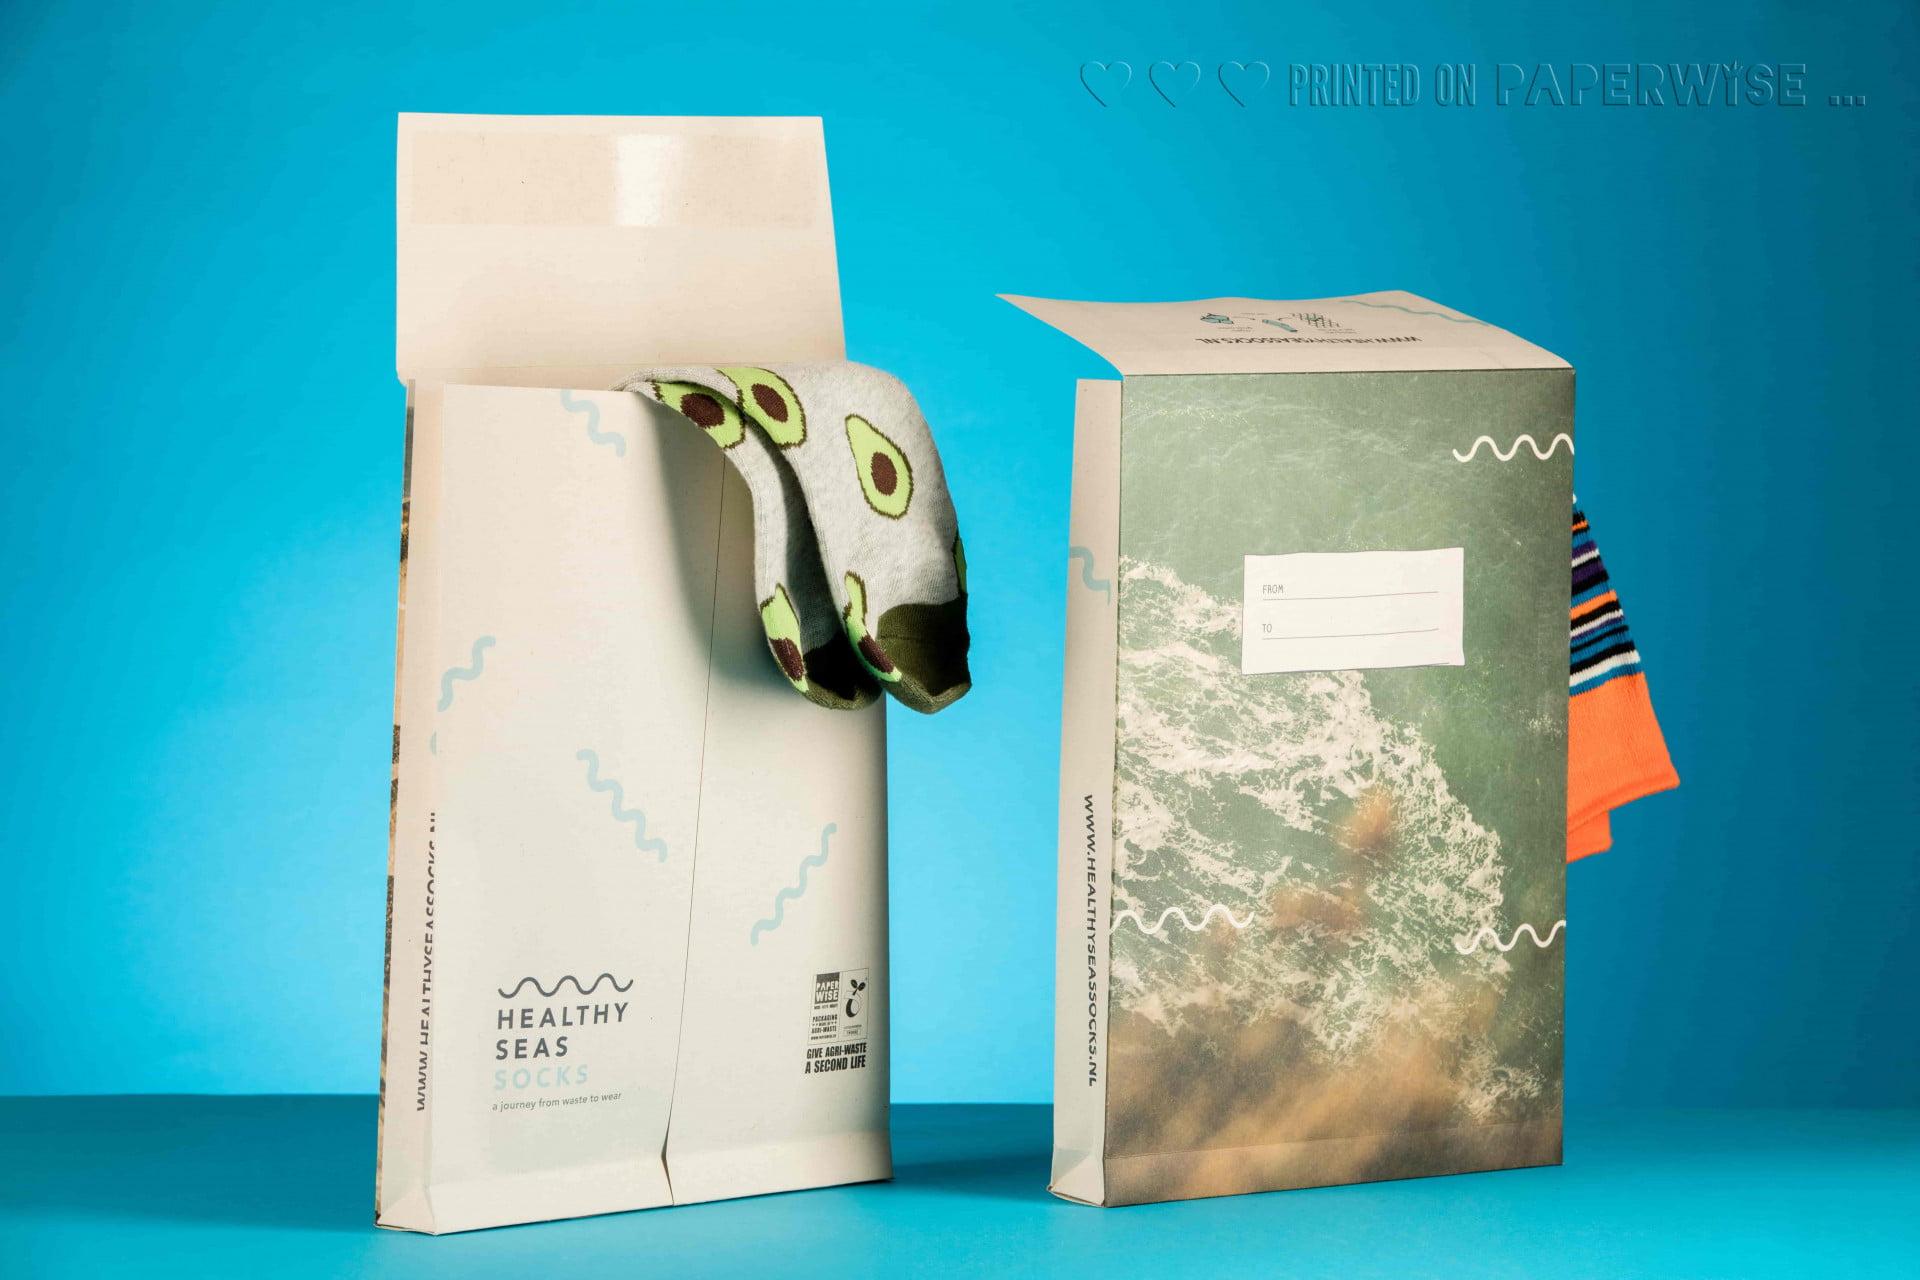 PaperWise eco friendly paper mailing envelope Healthy Seas Socks sustainable packaging